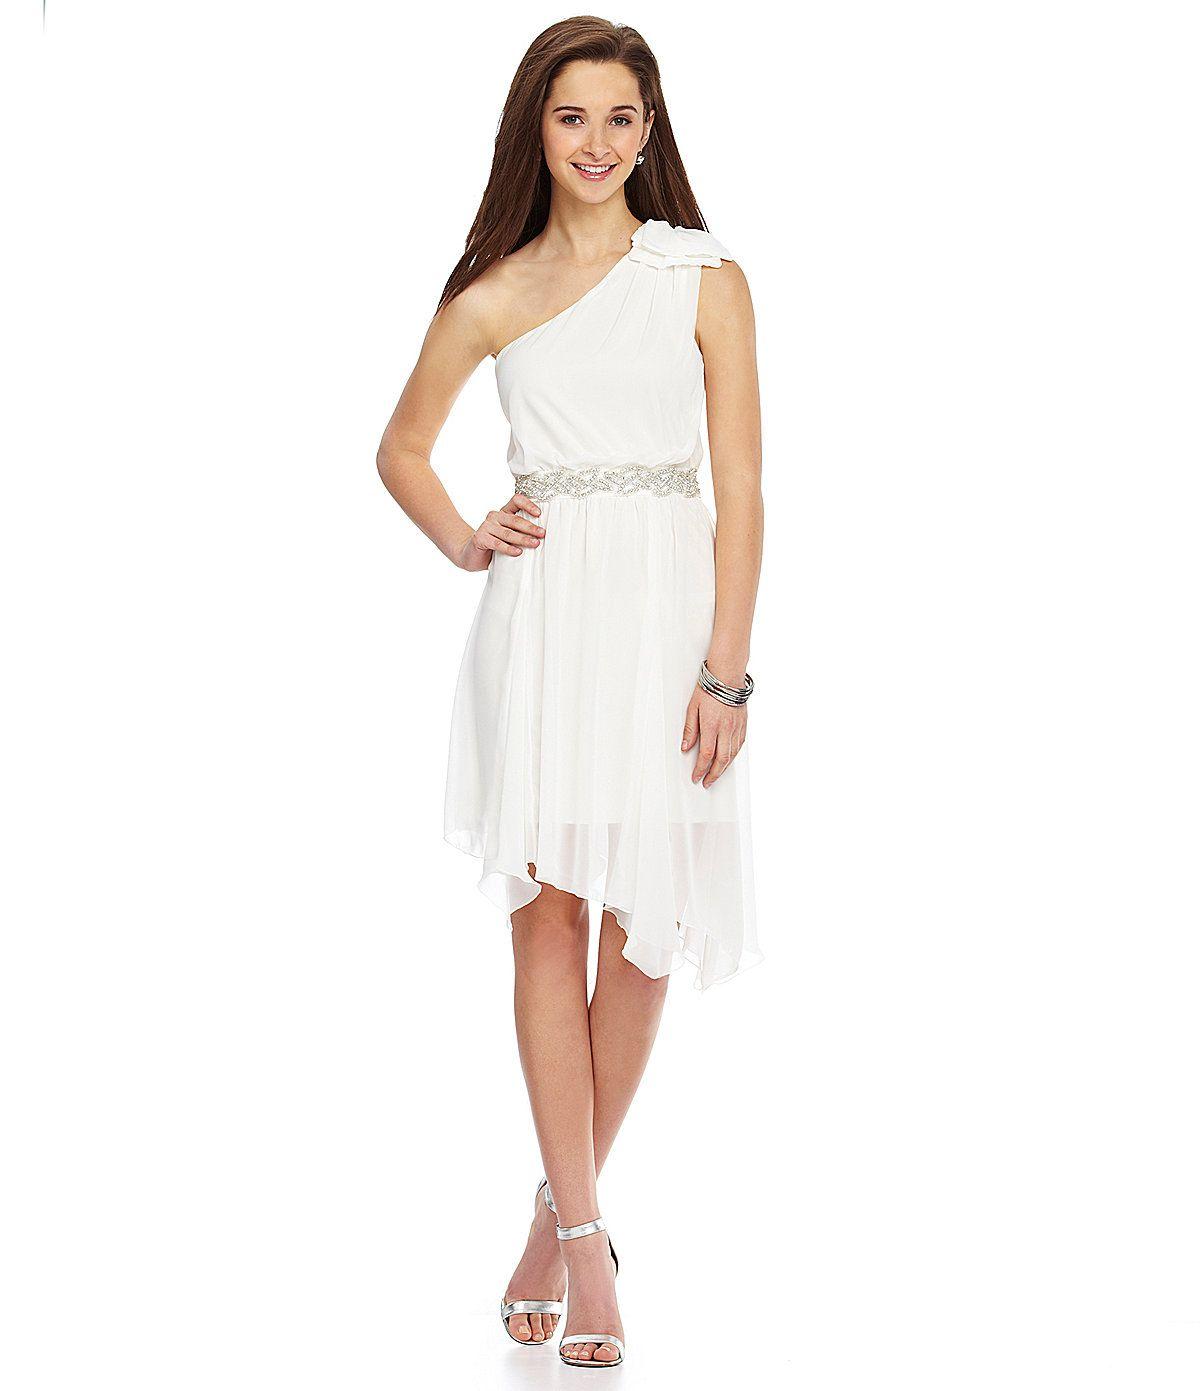 Jodi kristopher one shoulder beaded dress dillards jodi kristopher one shoulder beaded dress dillards ombrellifo Gallery